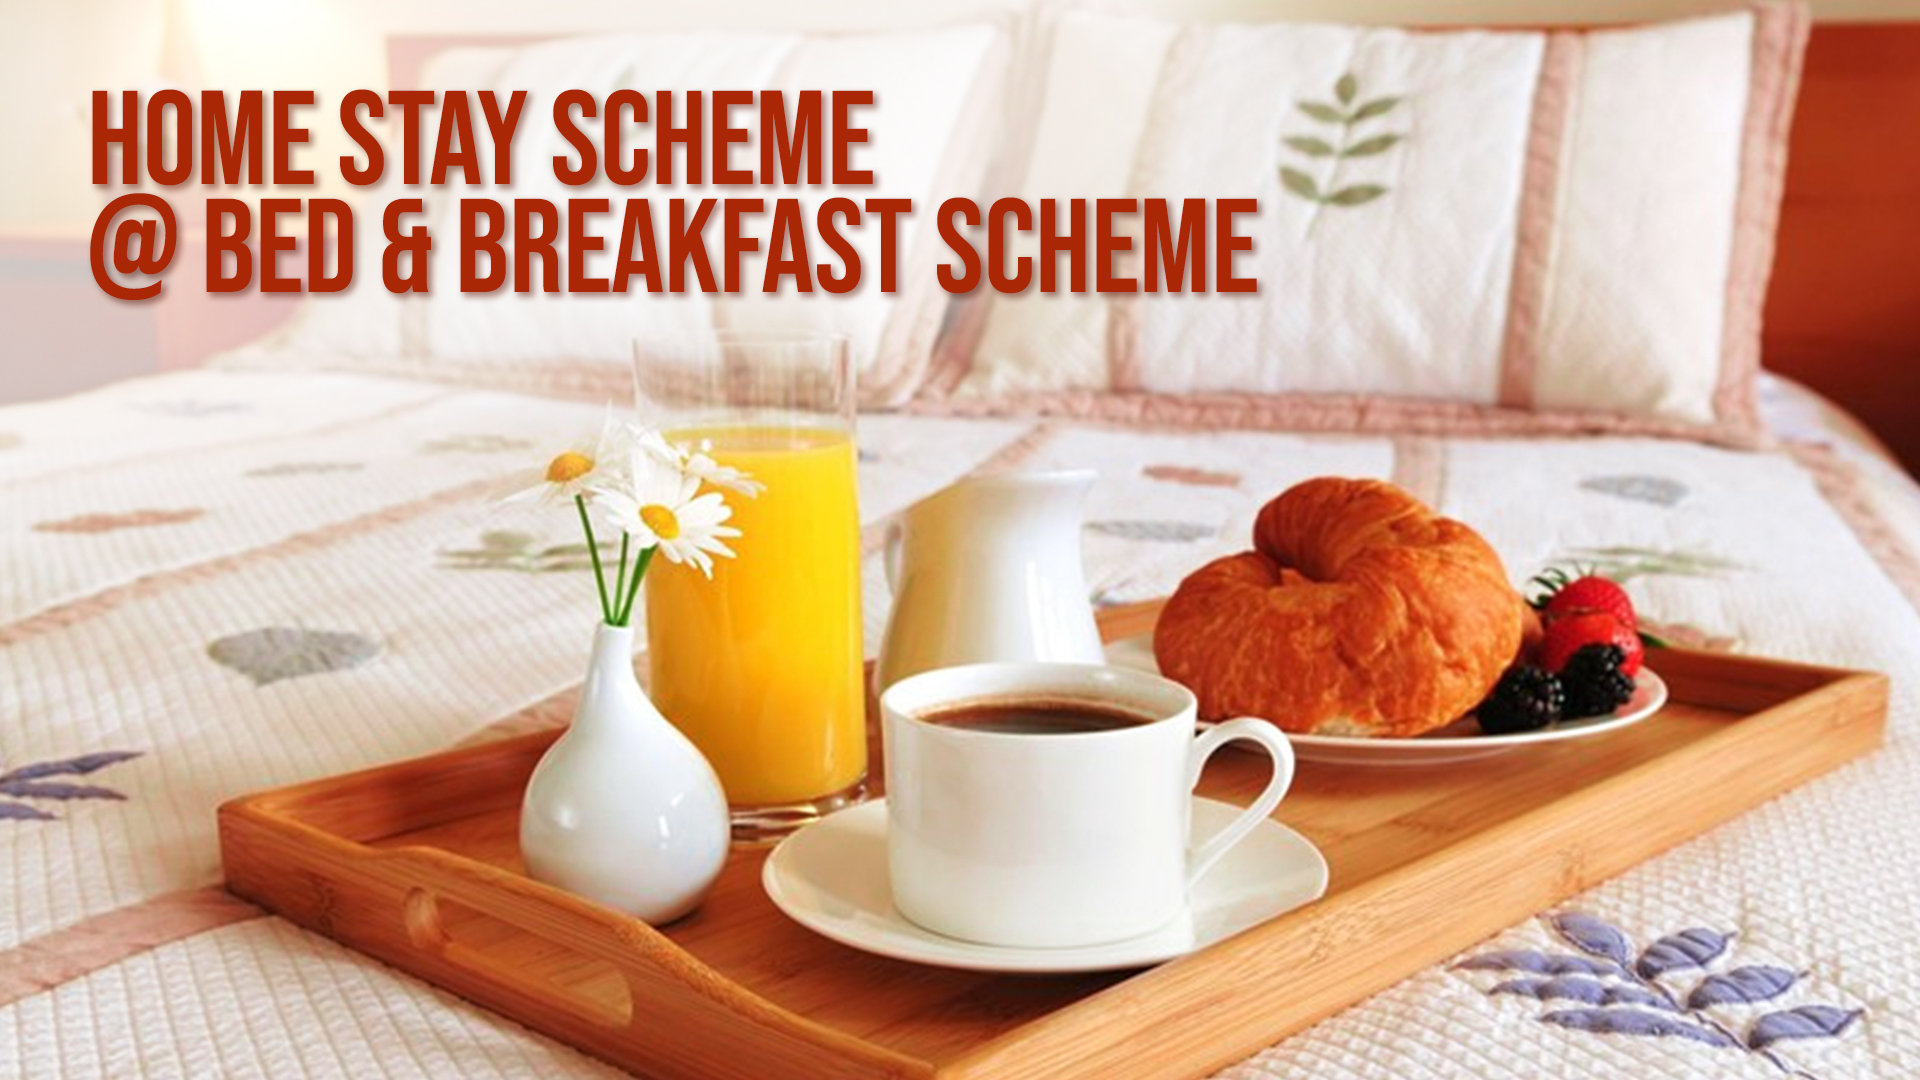 Home Stay Scheme @ Bed & Breakfast scheme A Novel Approach in Hospitality